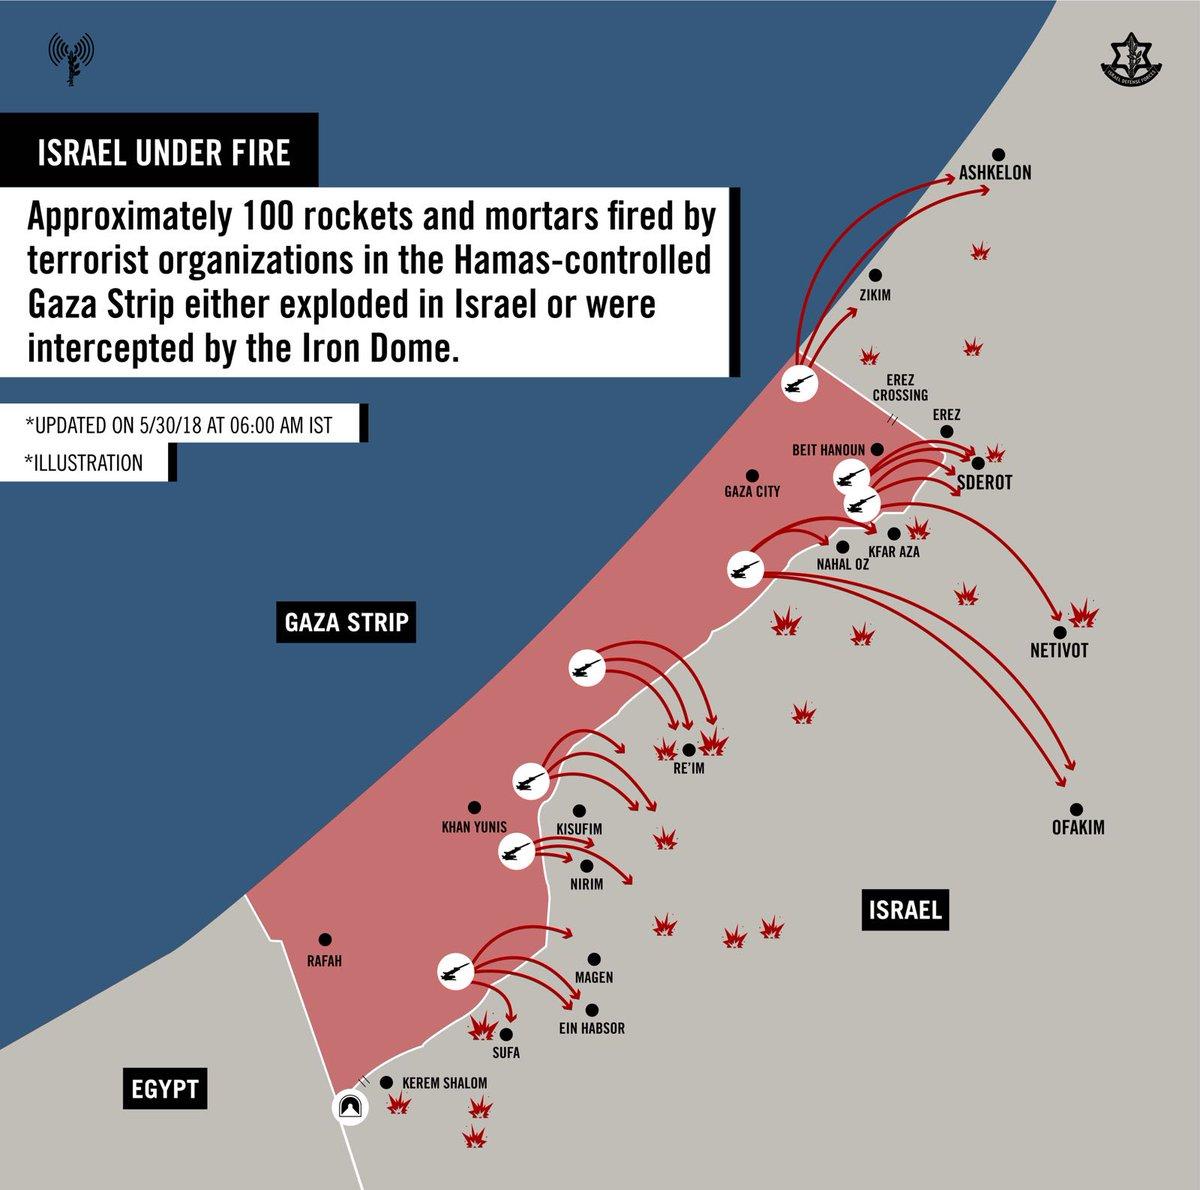 Gaza Strip Escalation - May 29-30, 2018 (Map, Photos, Videos) on gaza tunnels egypt floods, gaza tunnels sad, gaza explosion, gaza terror tunnels, gaza border map, gaza tunnels under kindergartens, gaza strip,